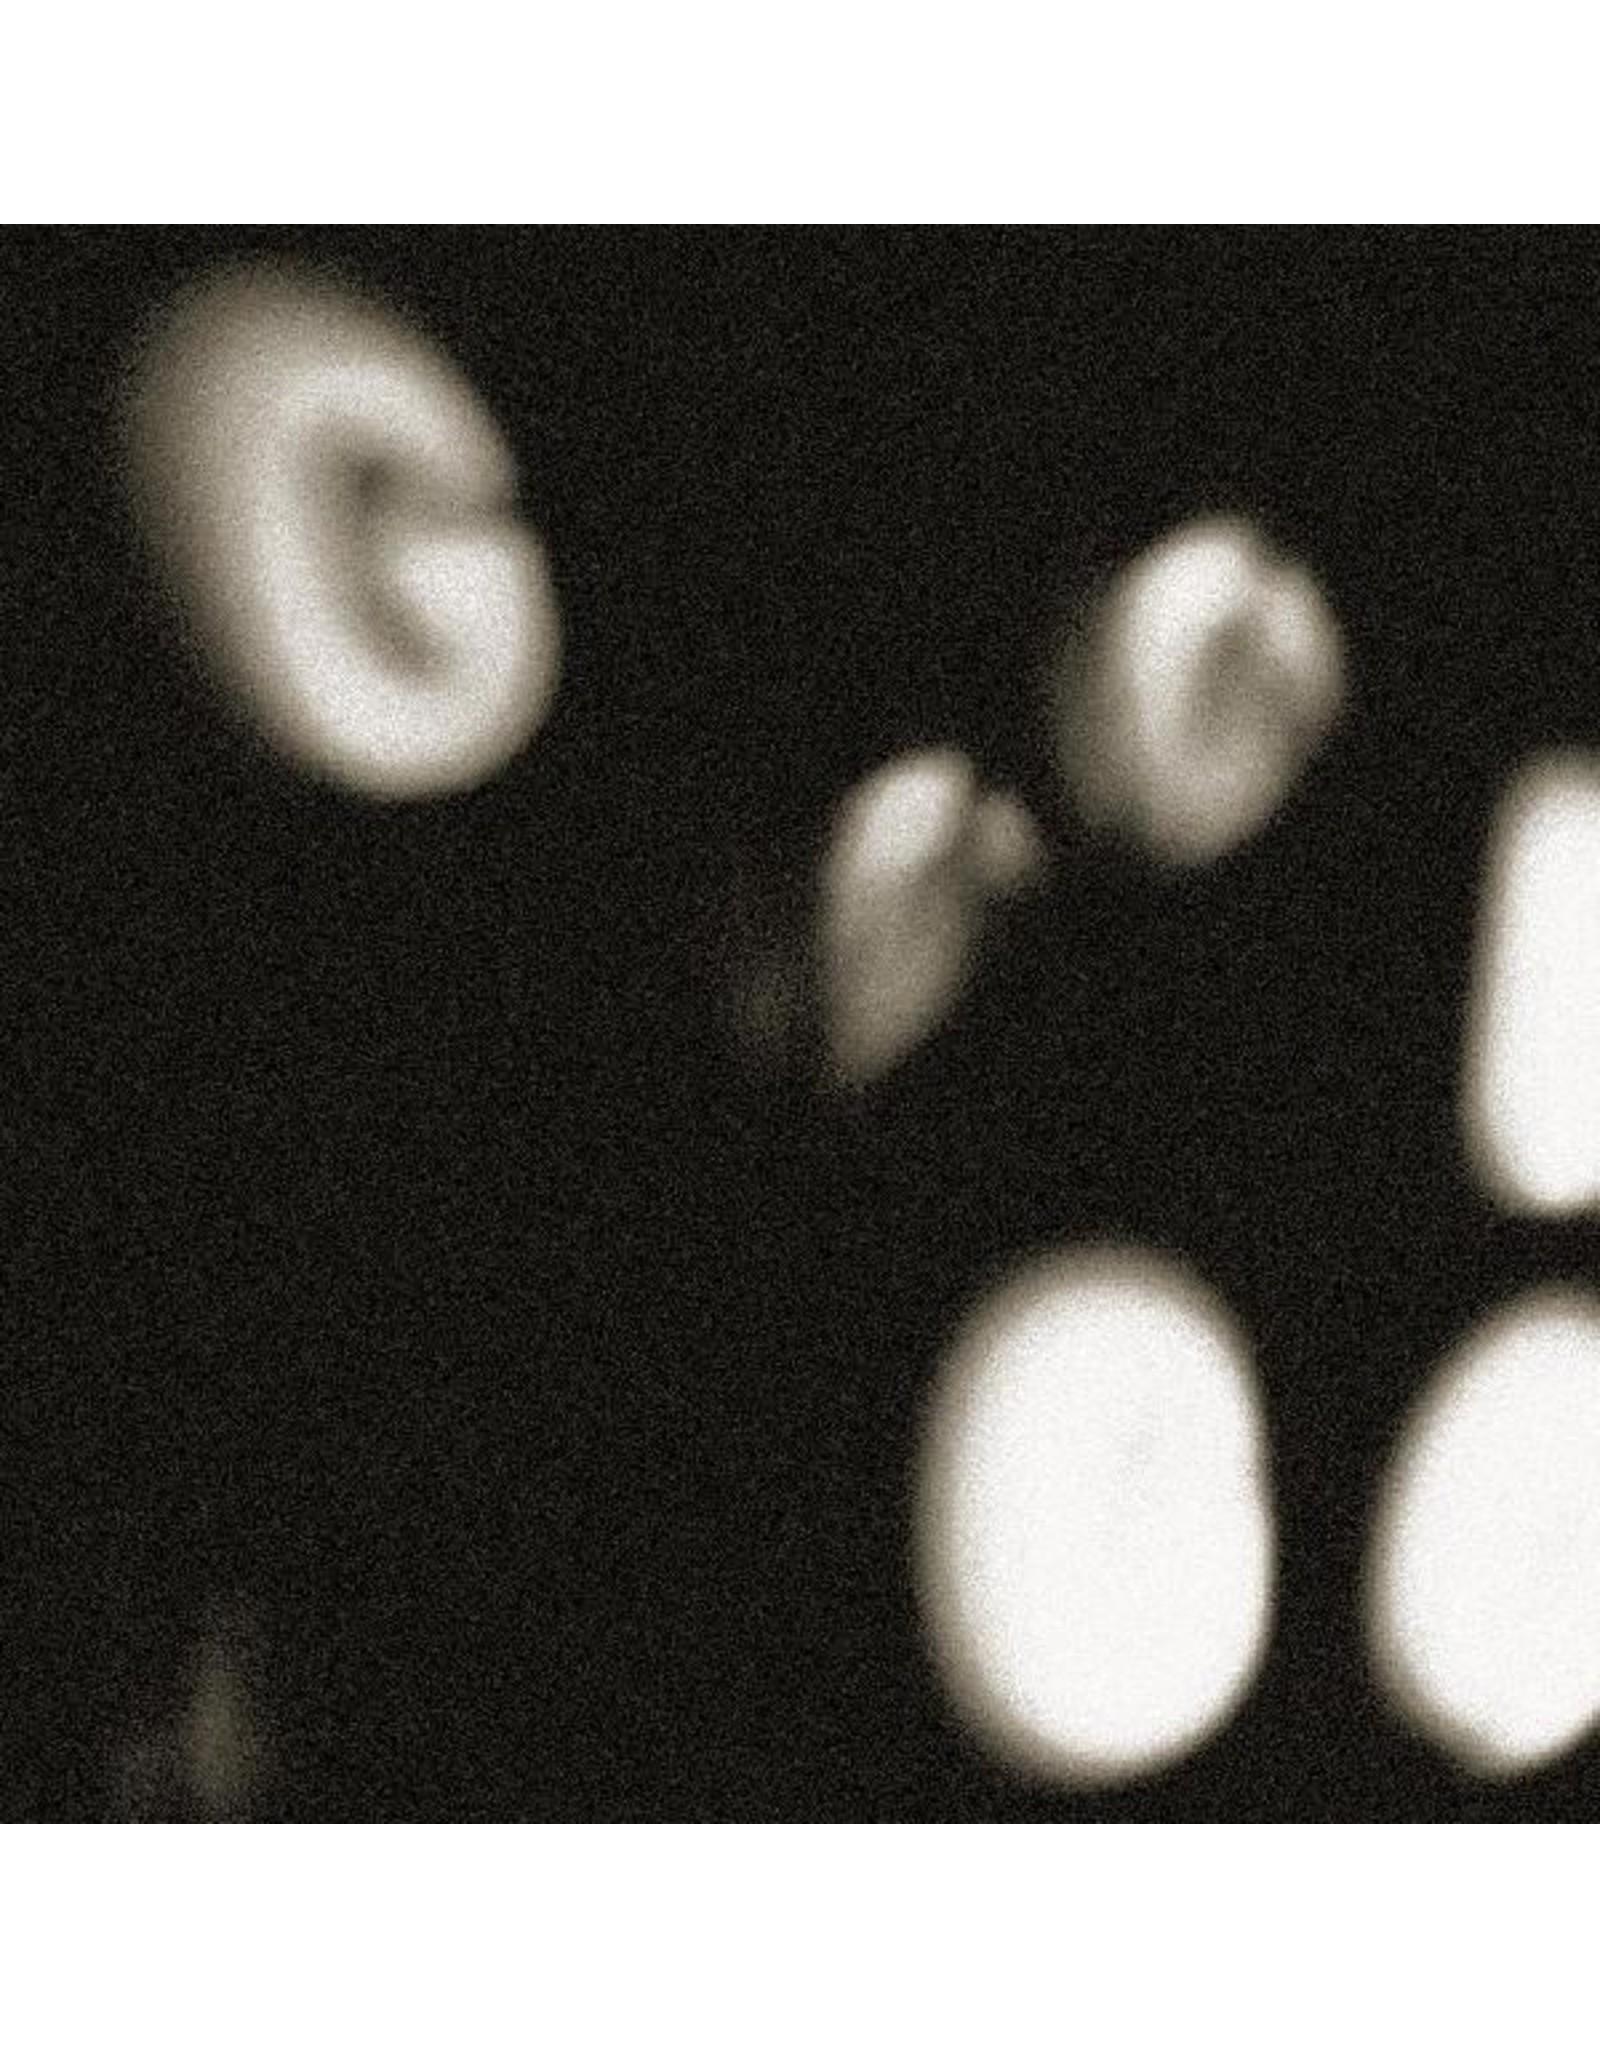 New Vinyl No Age - Goons Be Gone LP